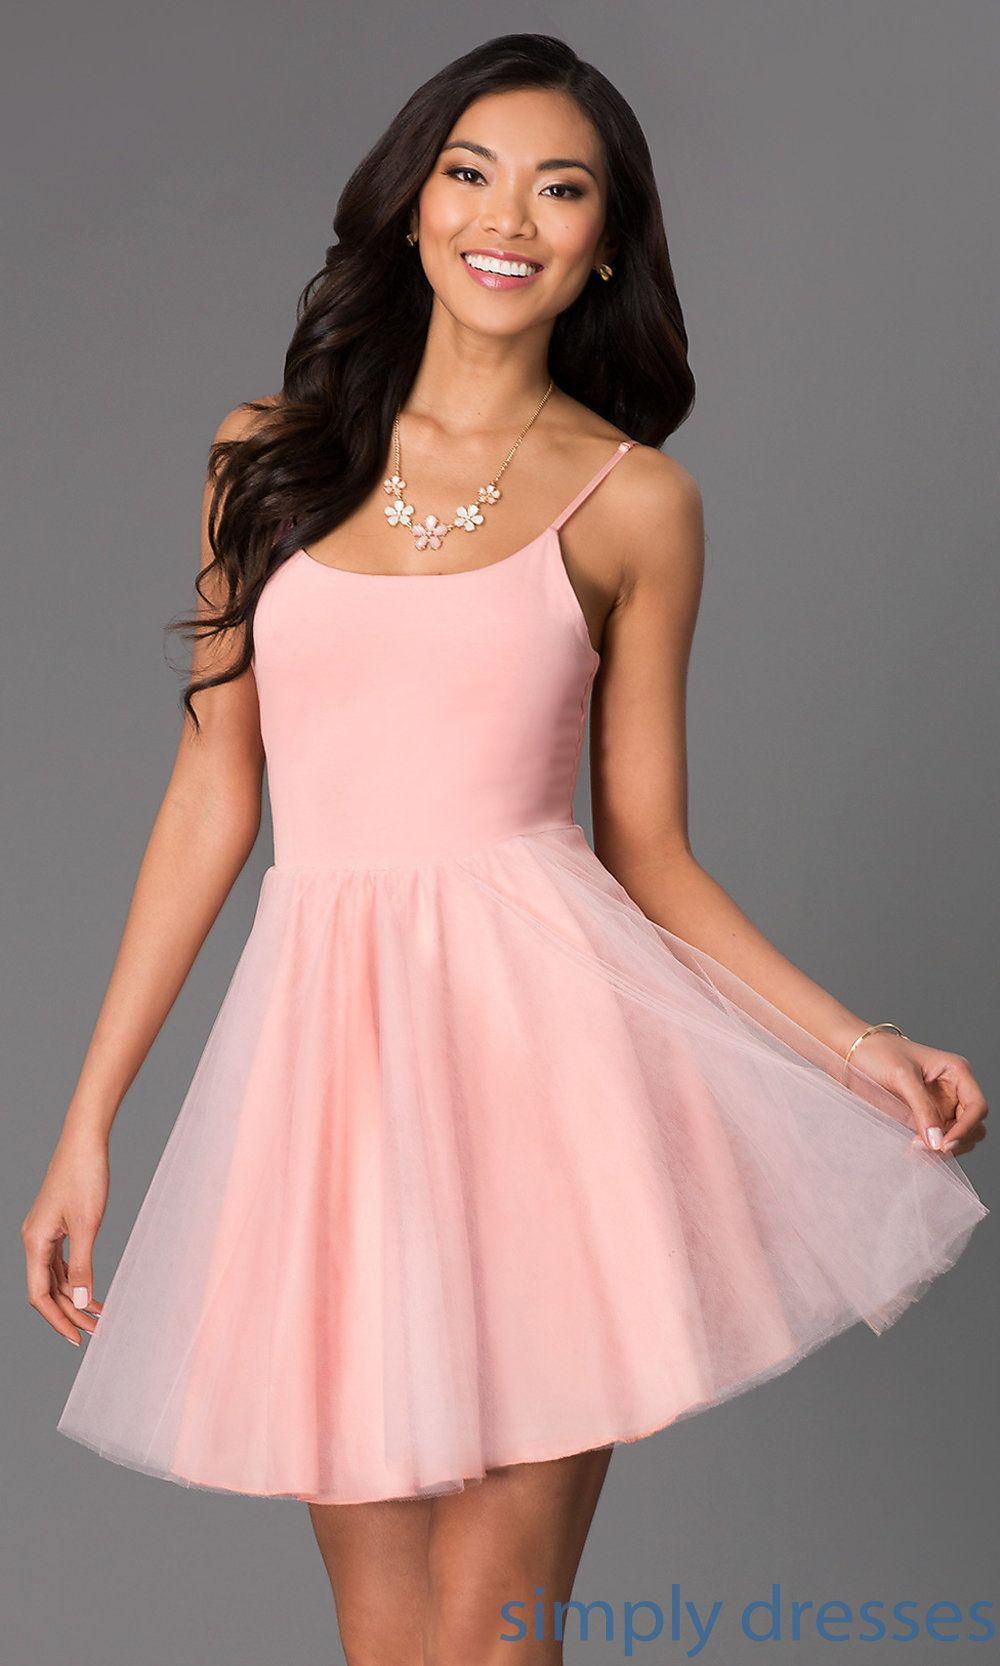 Dress, Short Spaghetti Strap Scoop Neck Dress by Emerald Sundae ...